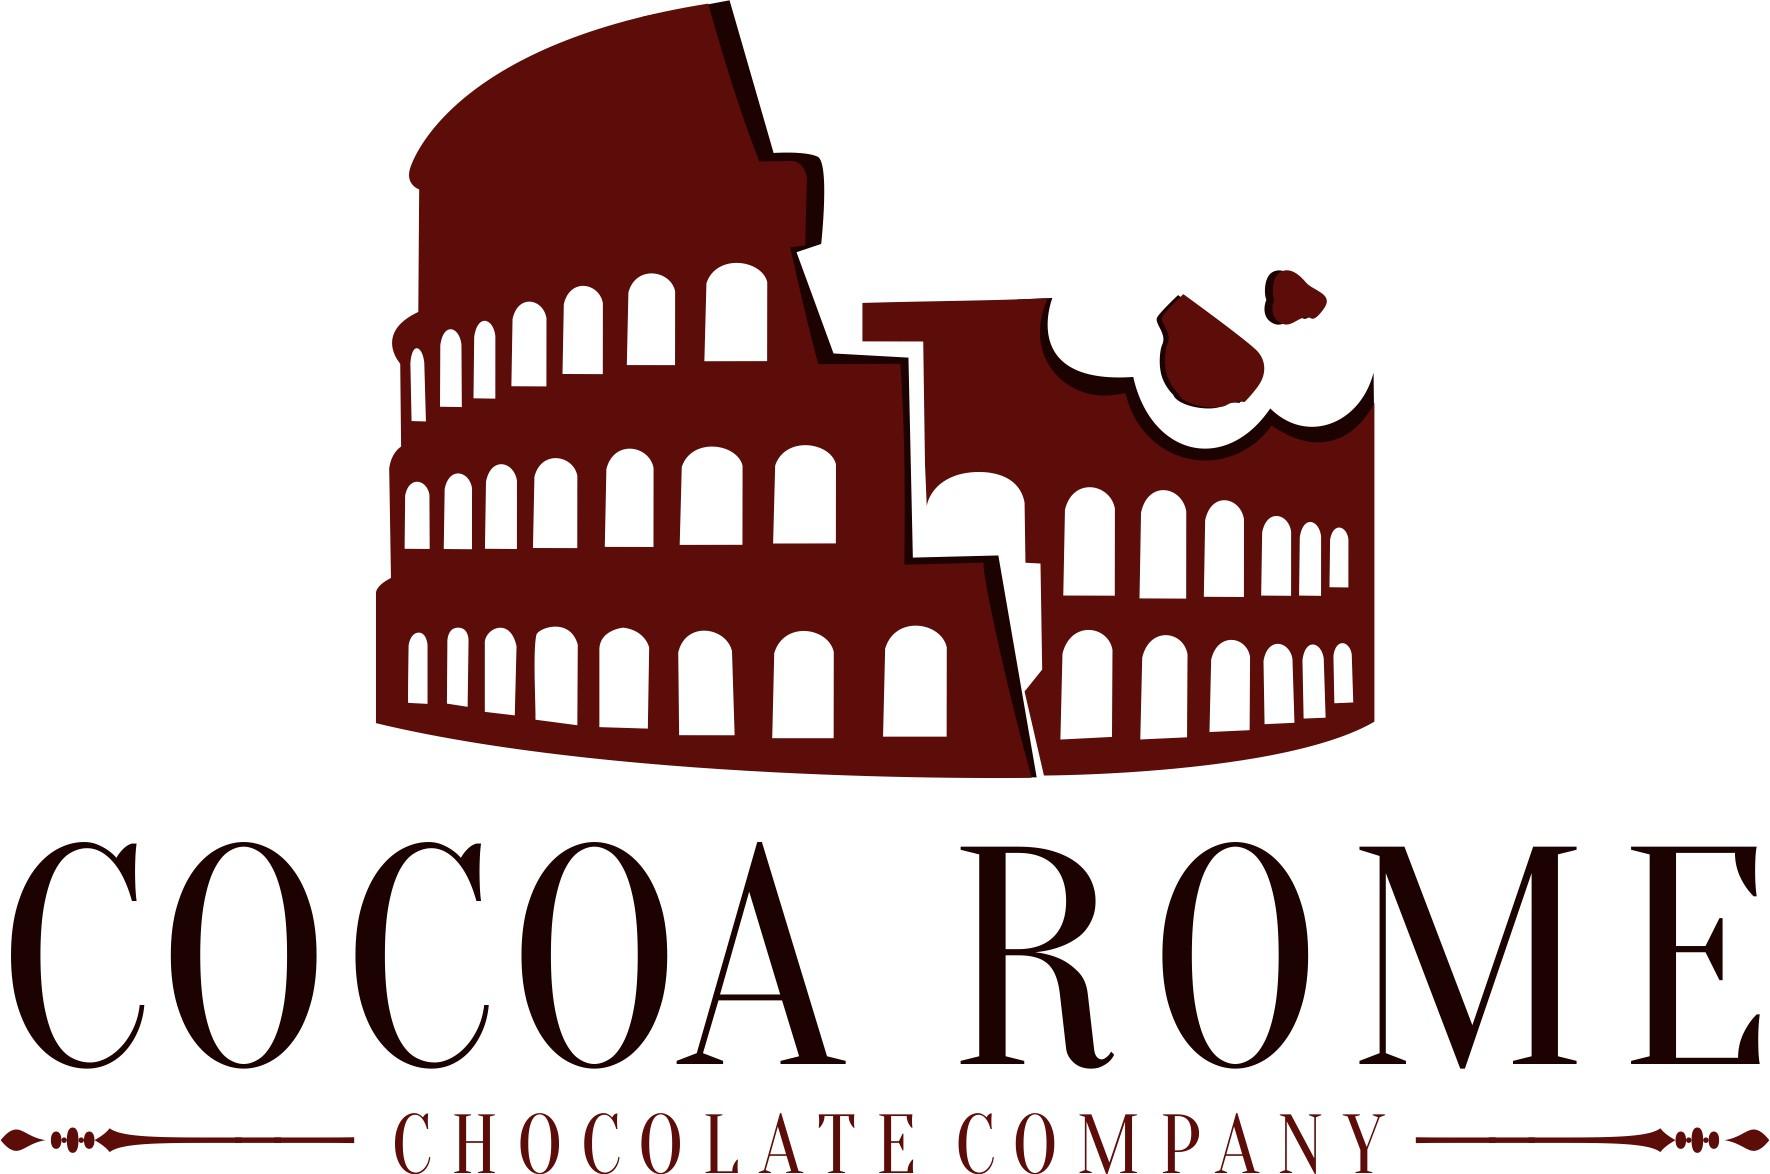 Chocolate Company Needs Classic, Organic Logo